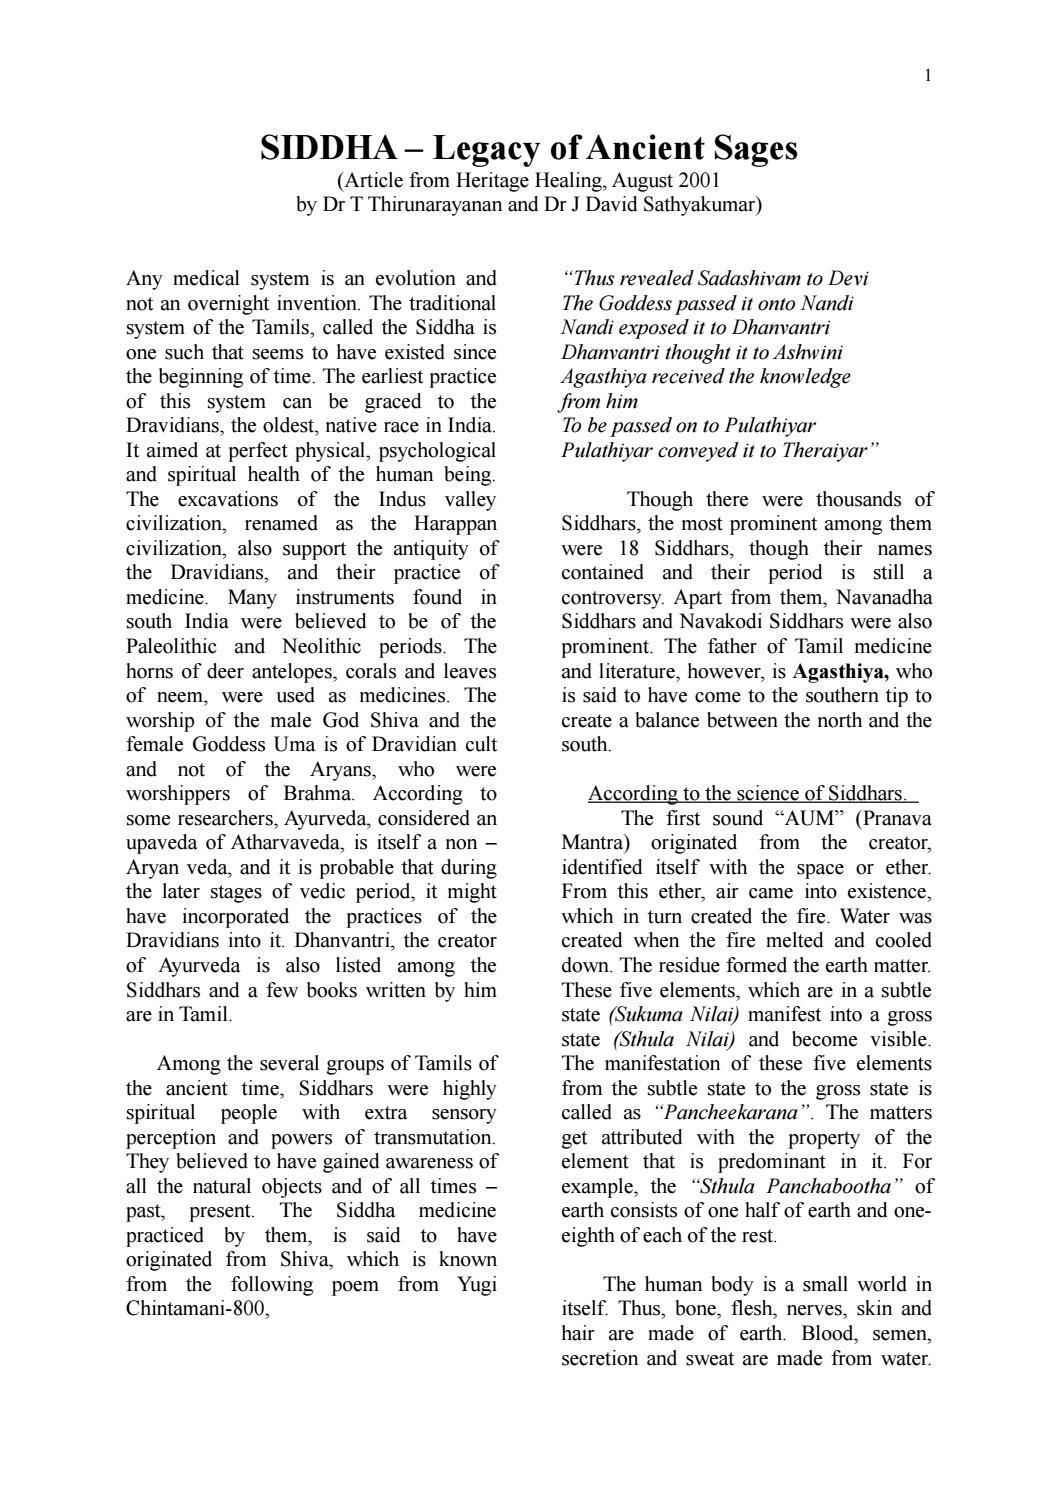 Siddha medicine article by premasagarr light - issuu